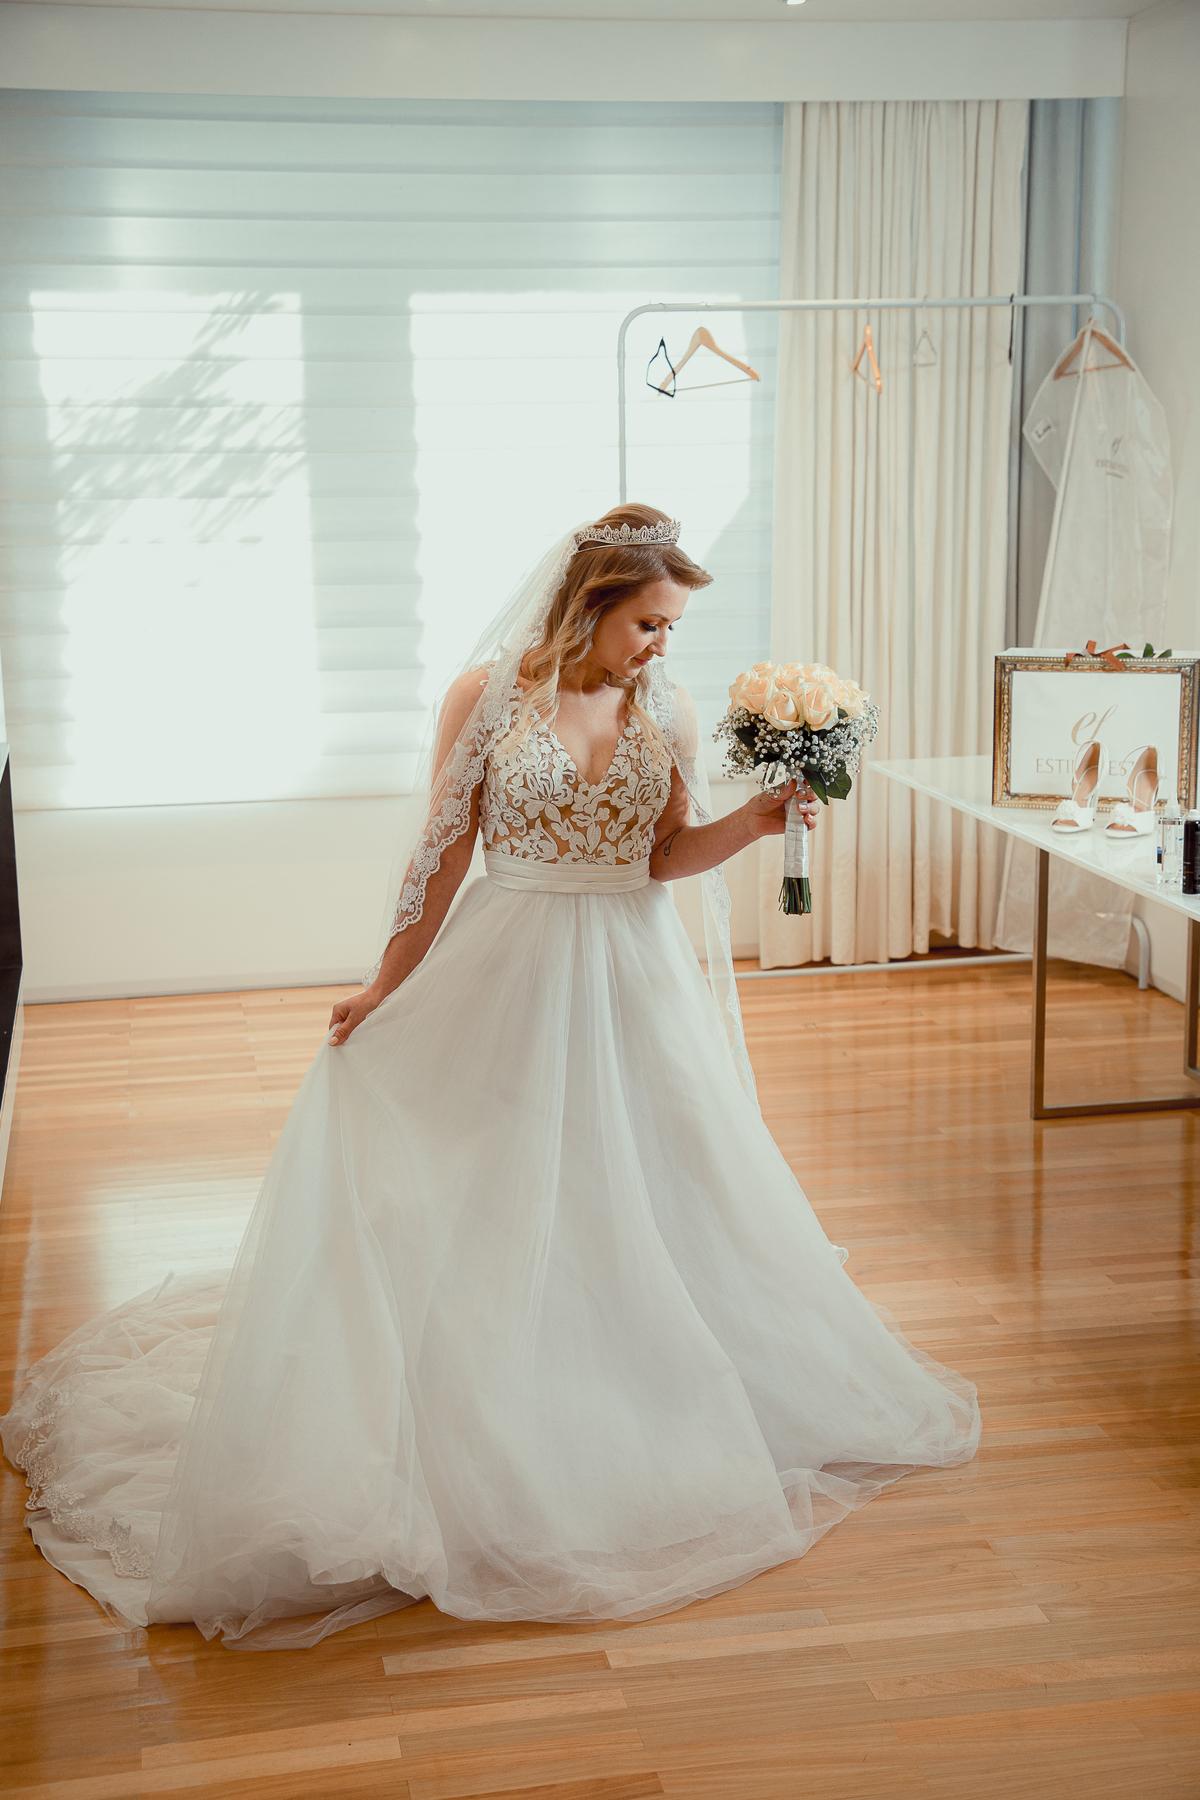 Beleza Cabelo Noiva Gramado Vestido Elopement Wedding